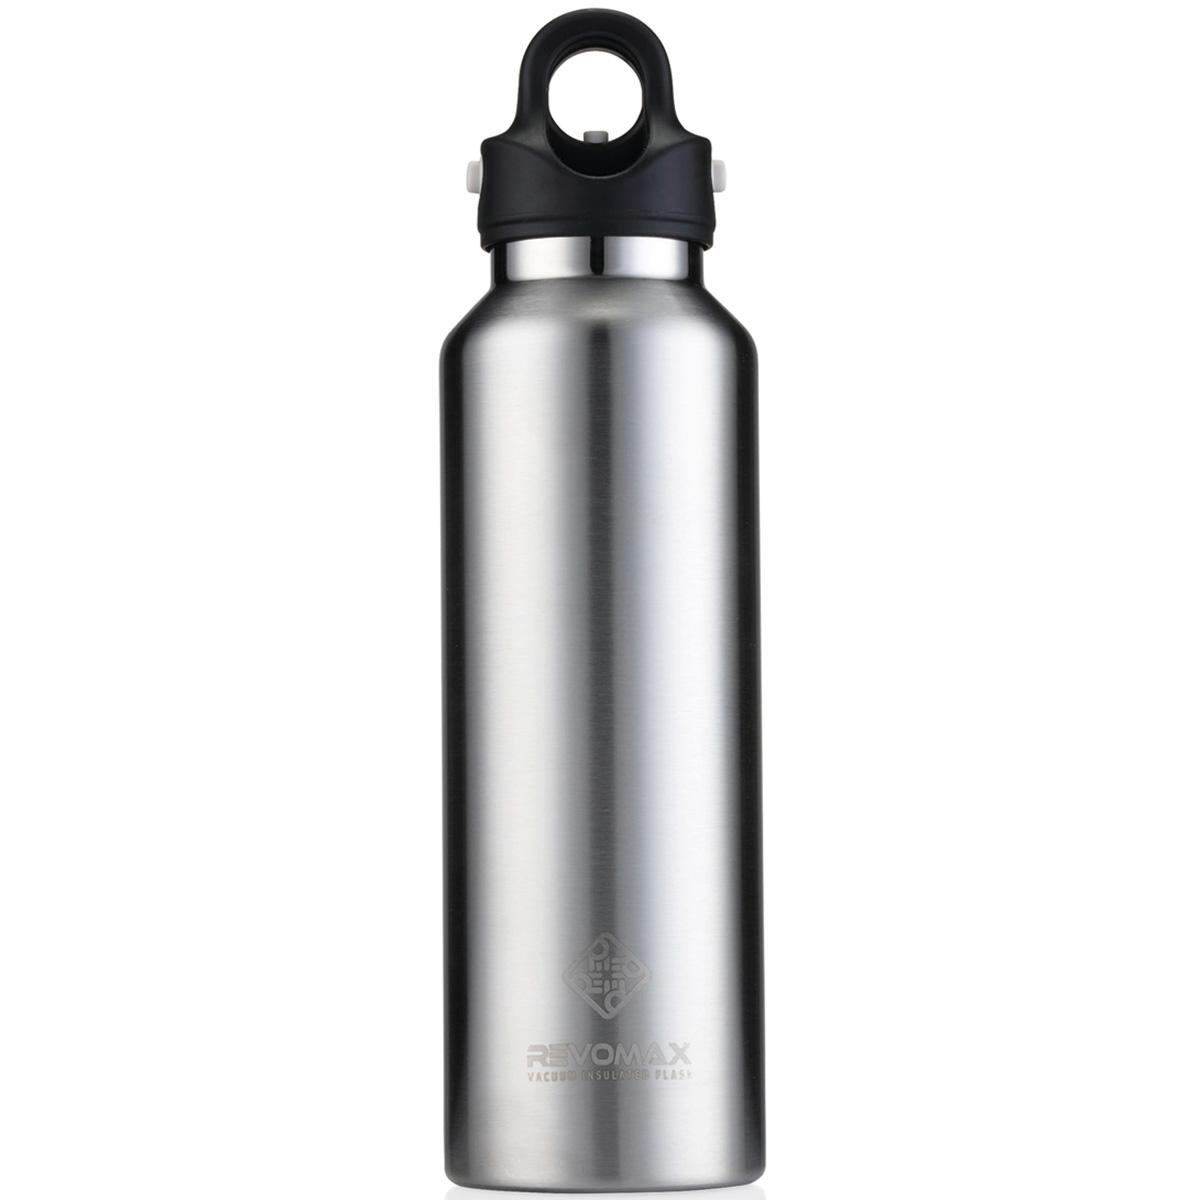 REVOMAX2 592ml 真空断熱ボトル